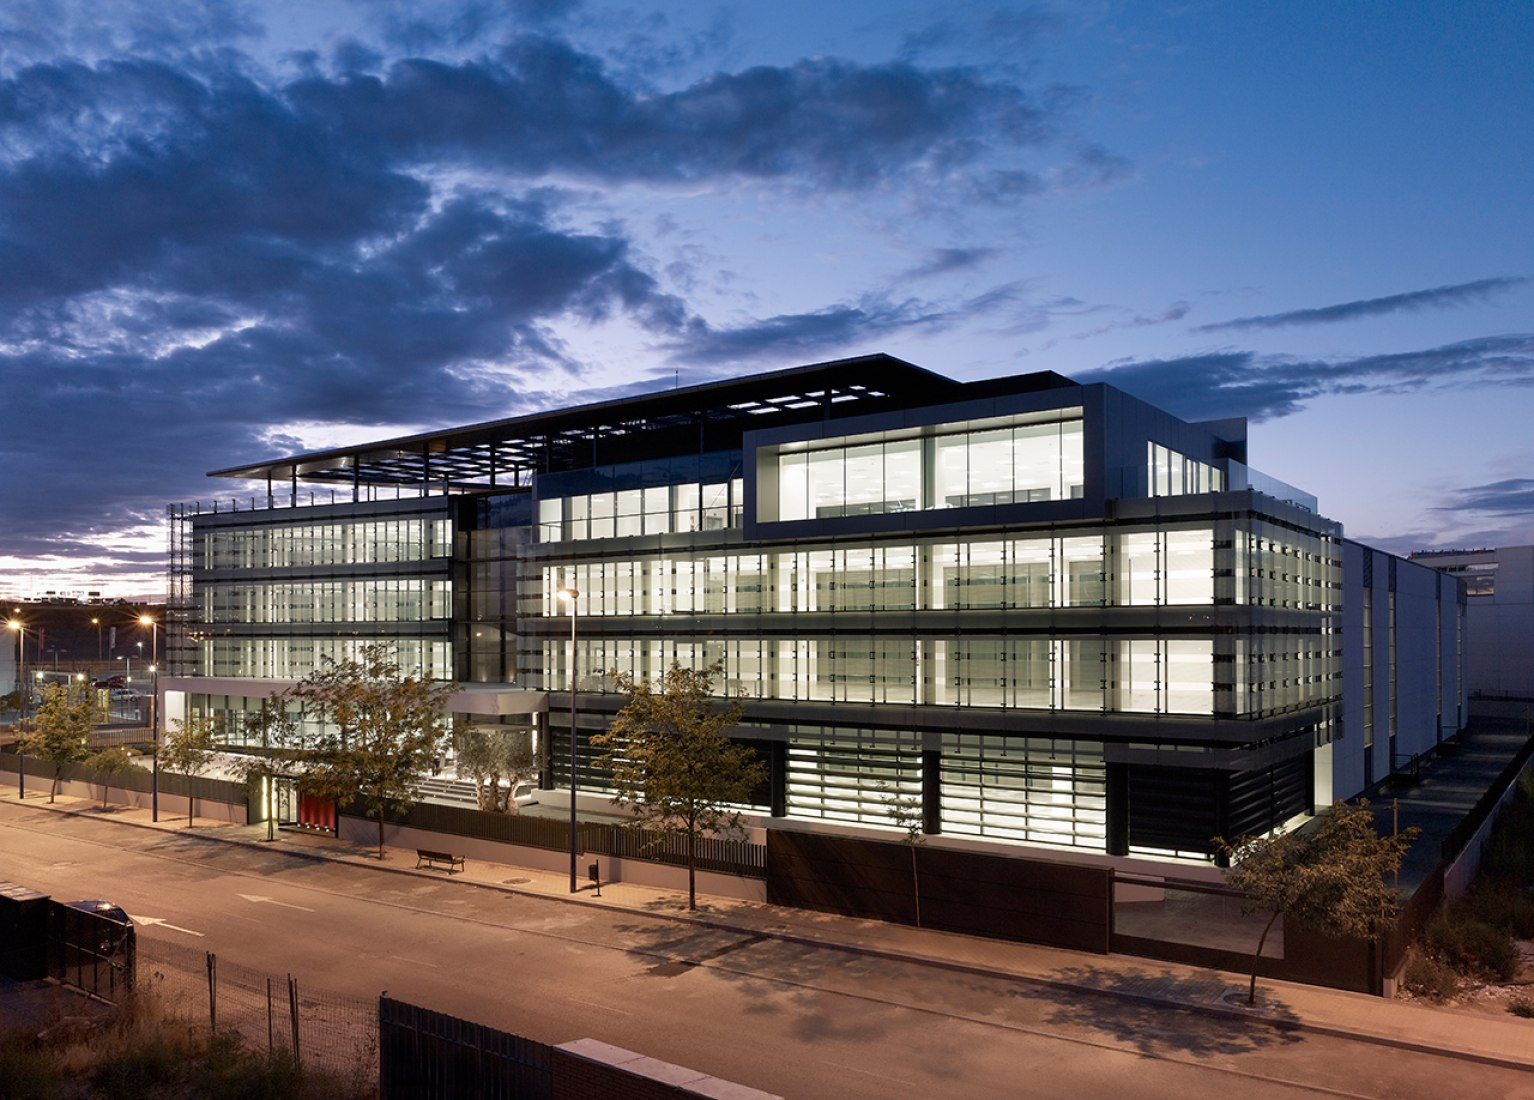 Bitácora Building, CPS Group Headquarters, Leganes. Touza Arquitectos. Julio Touza Rodríguez, Julio Touza Sacristán. Photography © Alfonso Quiroga.